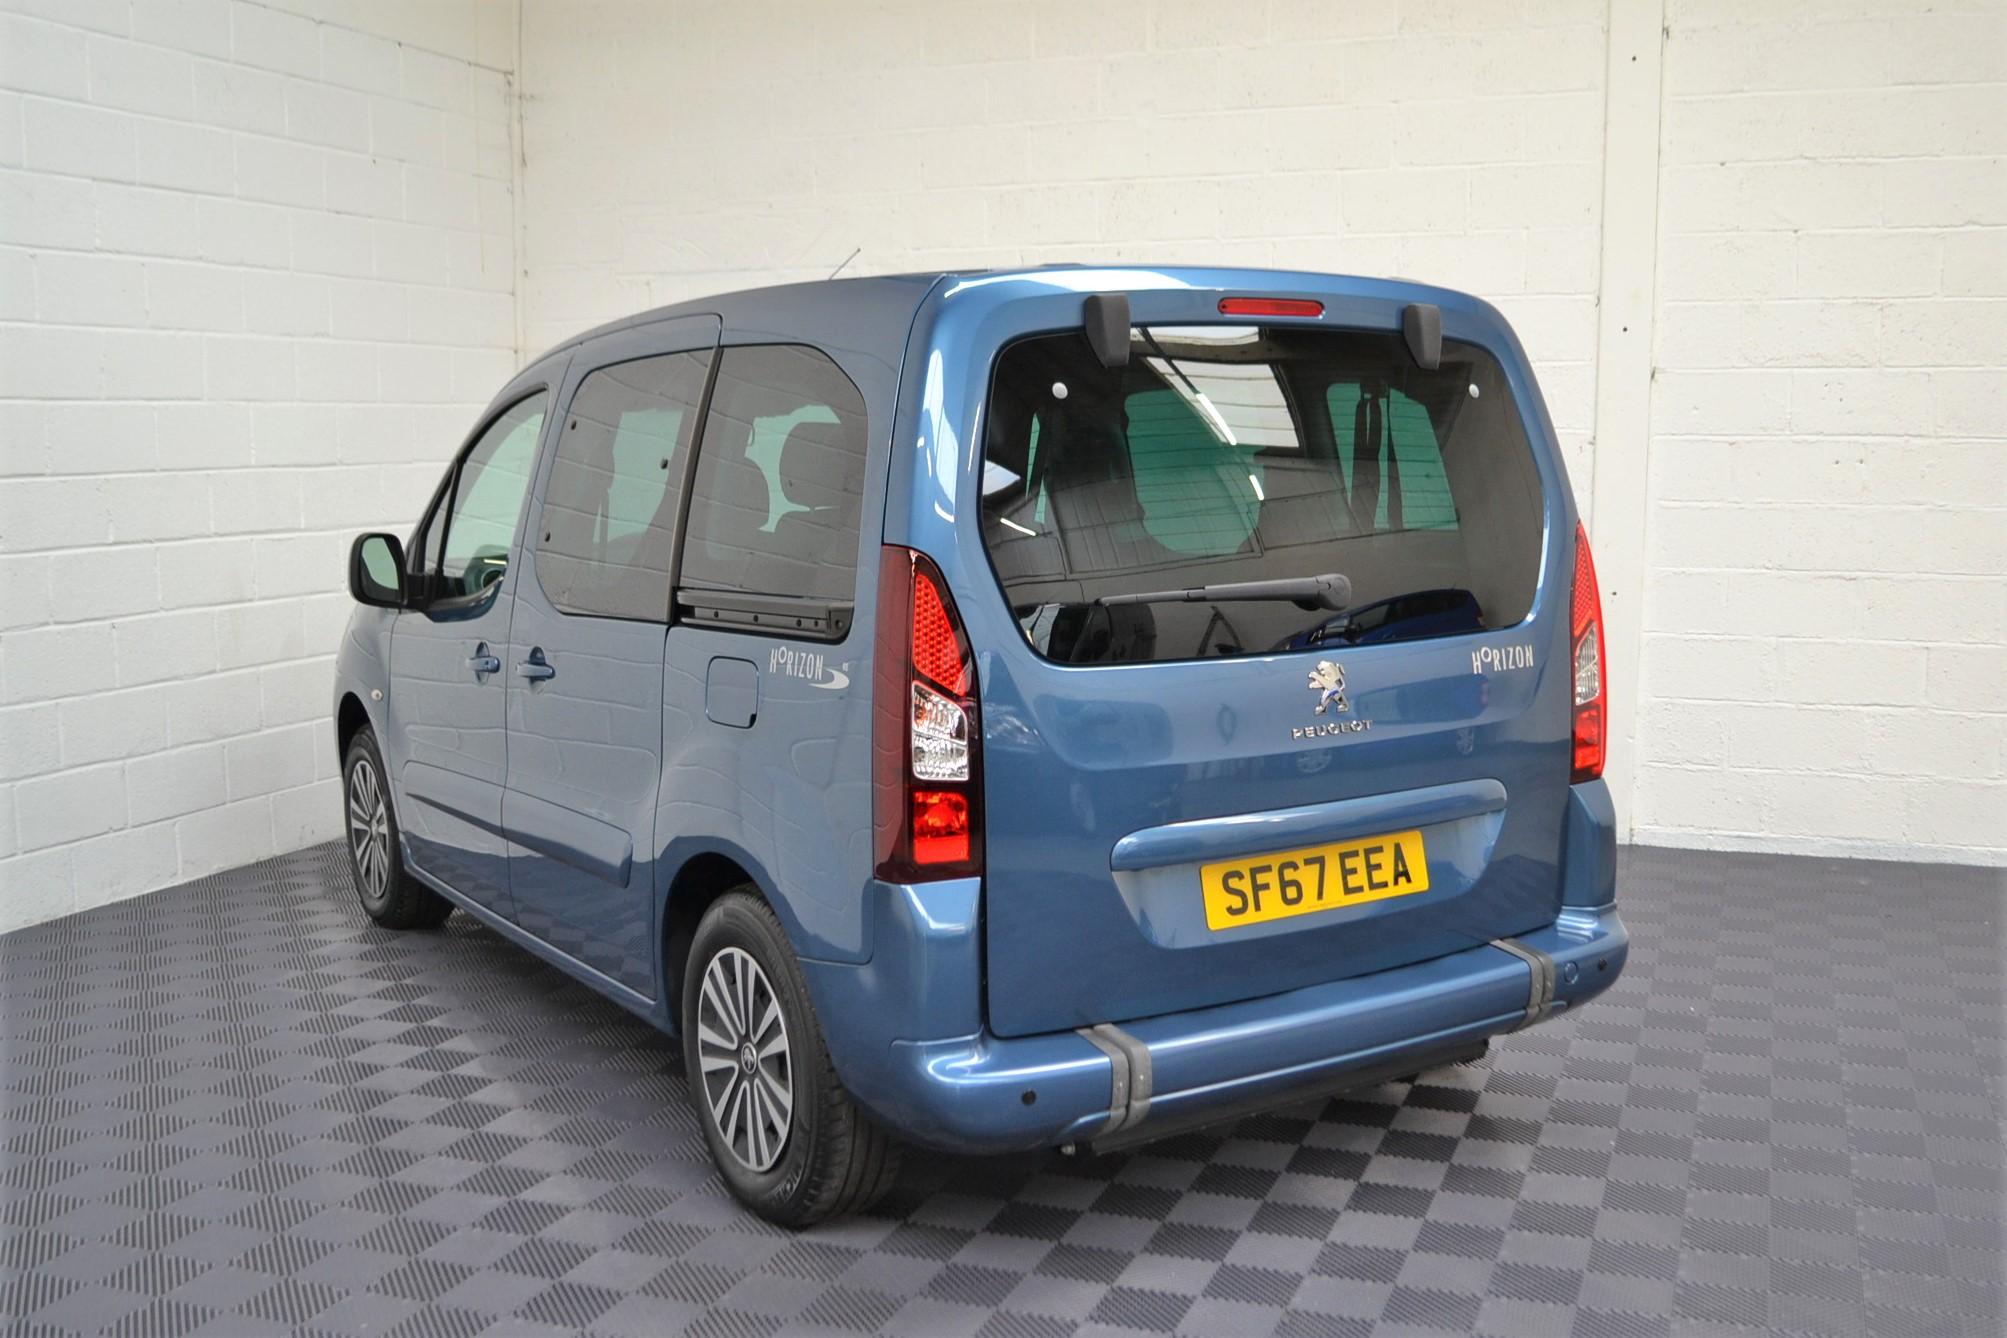 WAV Cars For Sale Bristol Wheelchair Accessible Vehicles Used For Sale Somerset Devon Dorset Bath Peugeot Partner SF67 EEA 9